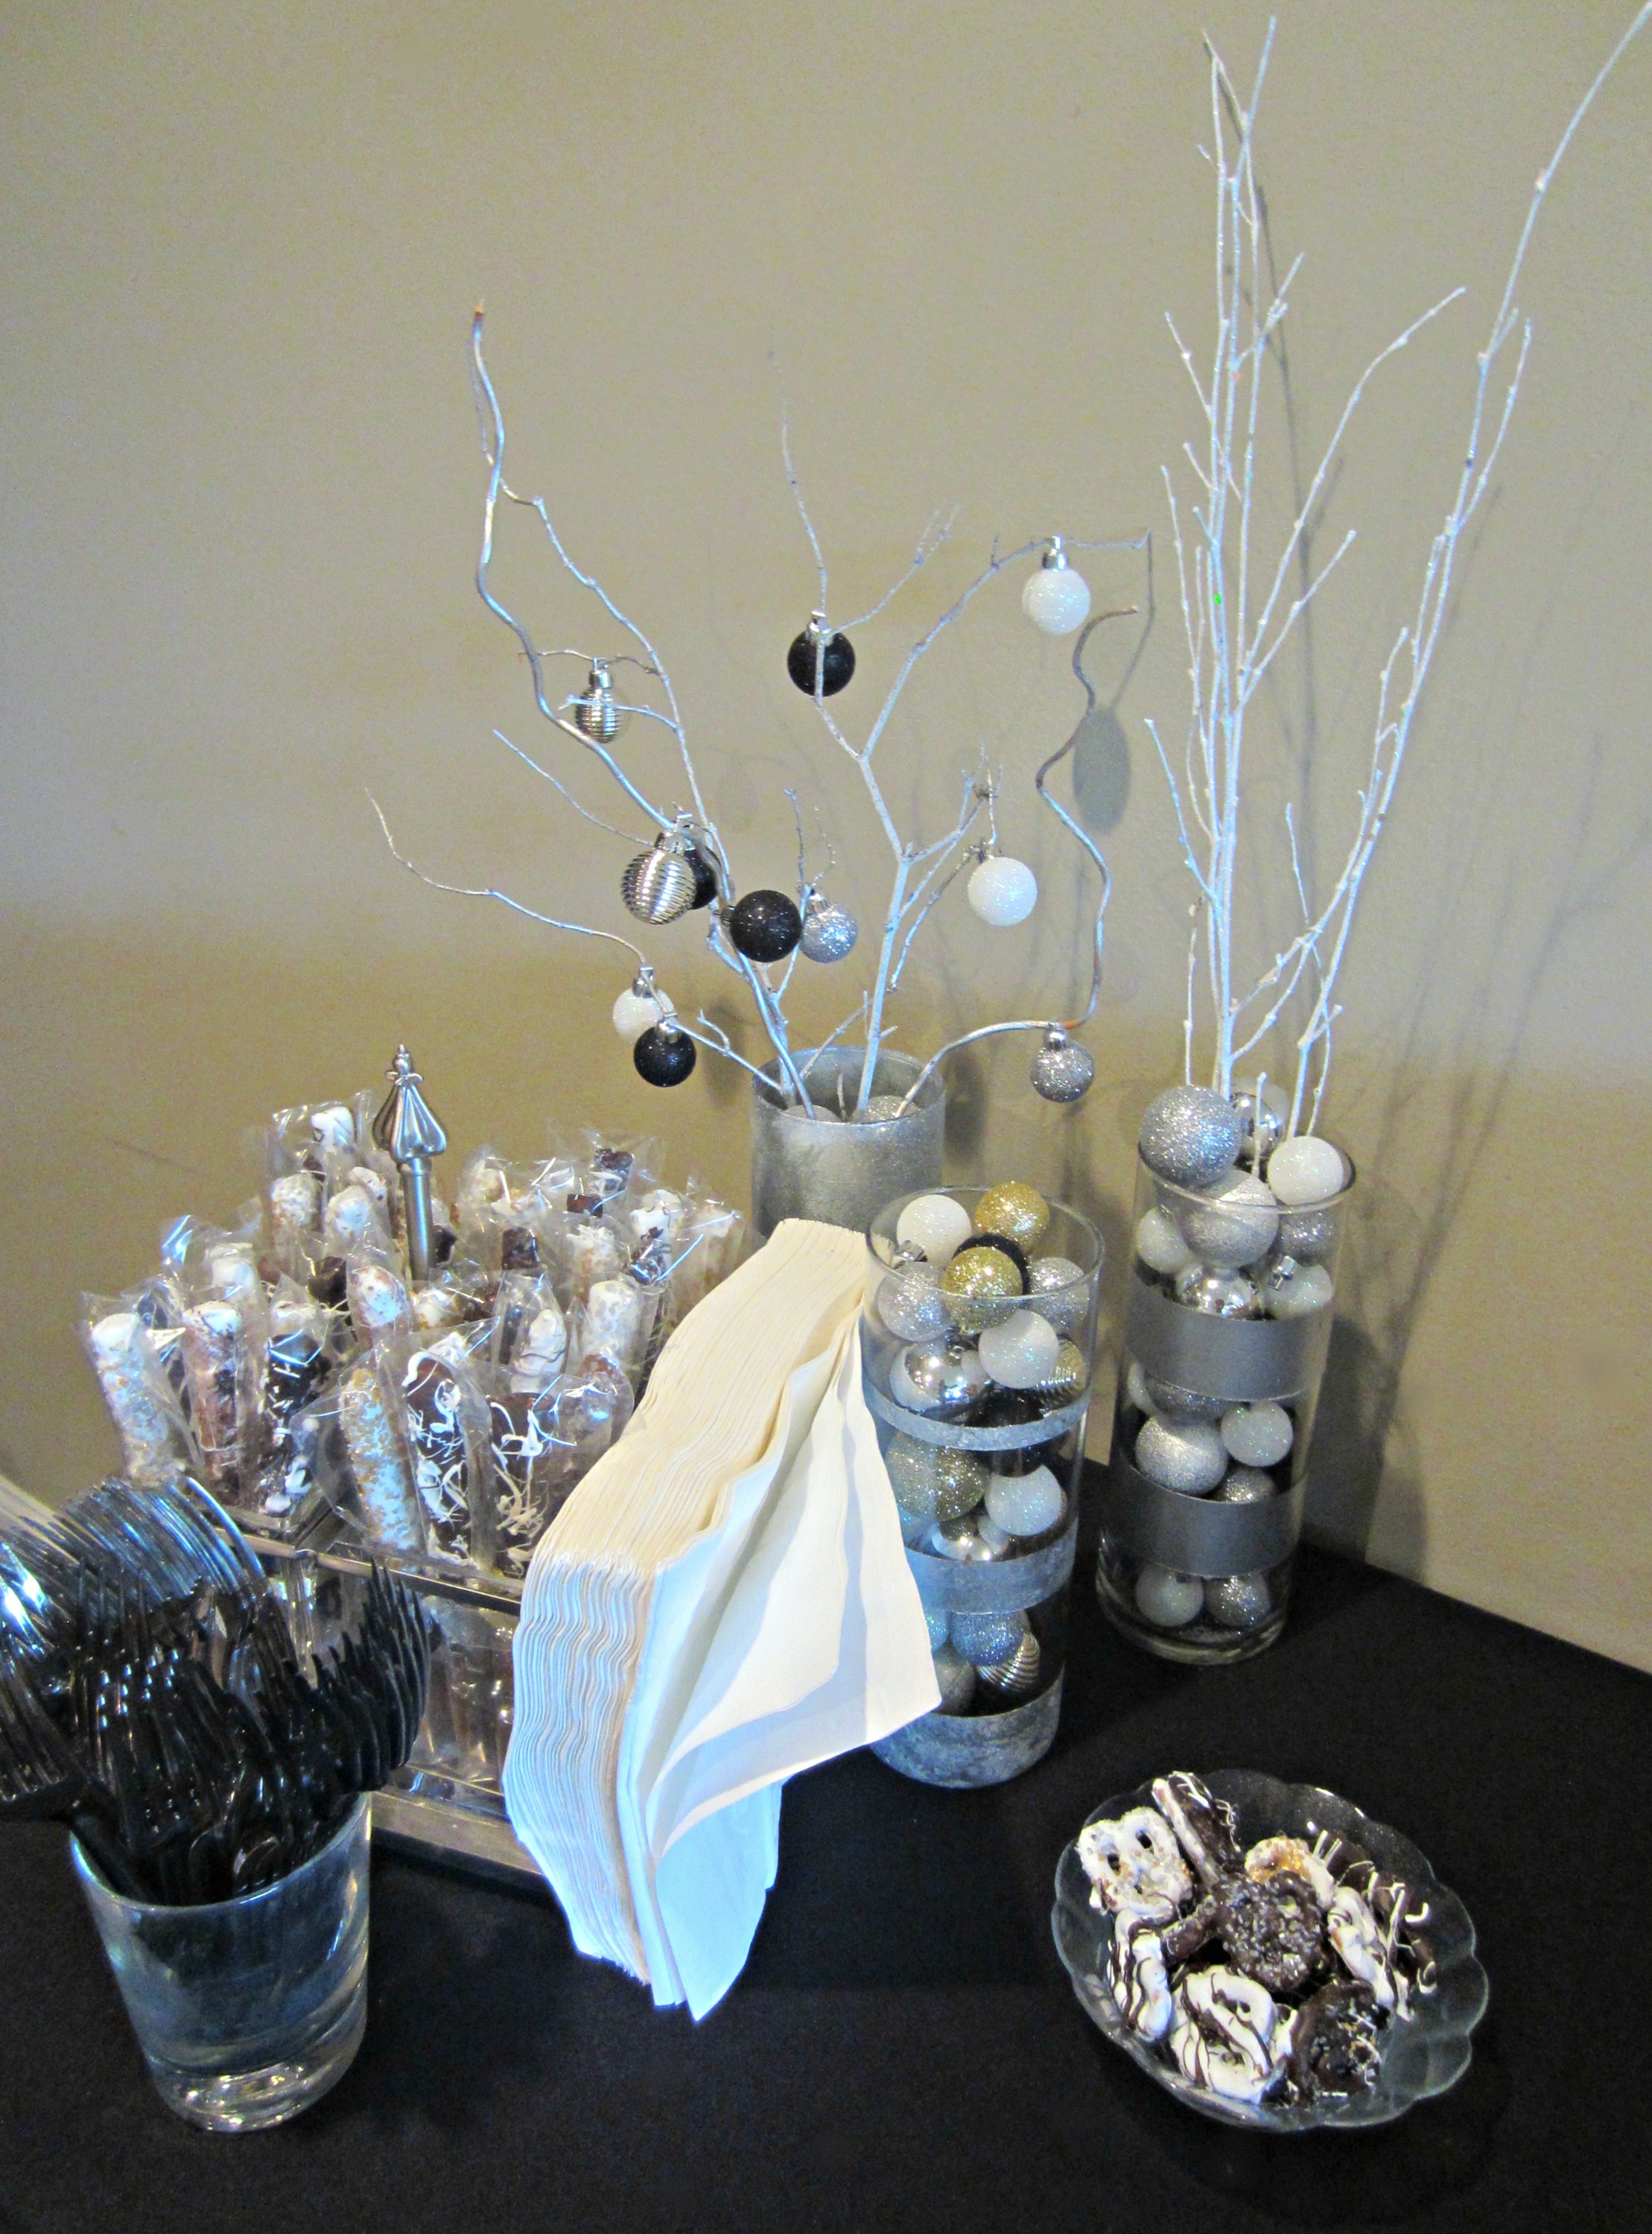 alexs bridal shower wedding shower decorations new years wedding bridal shower decorations